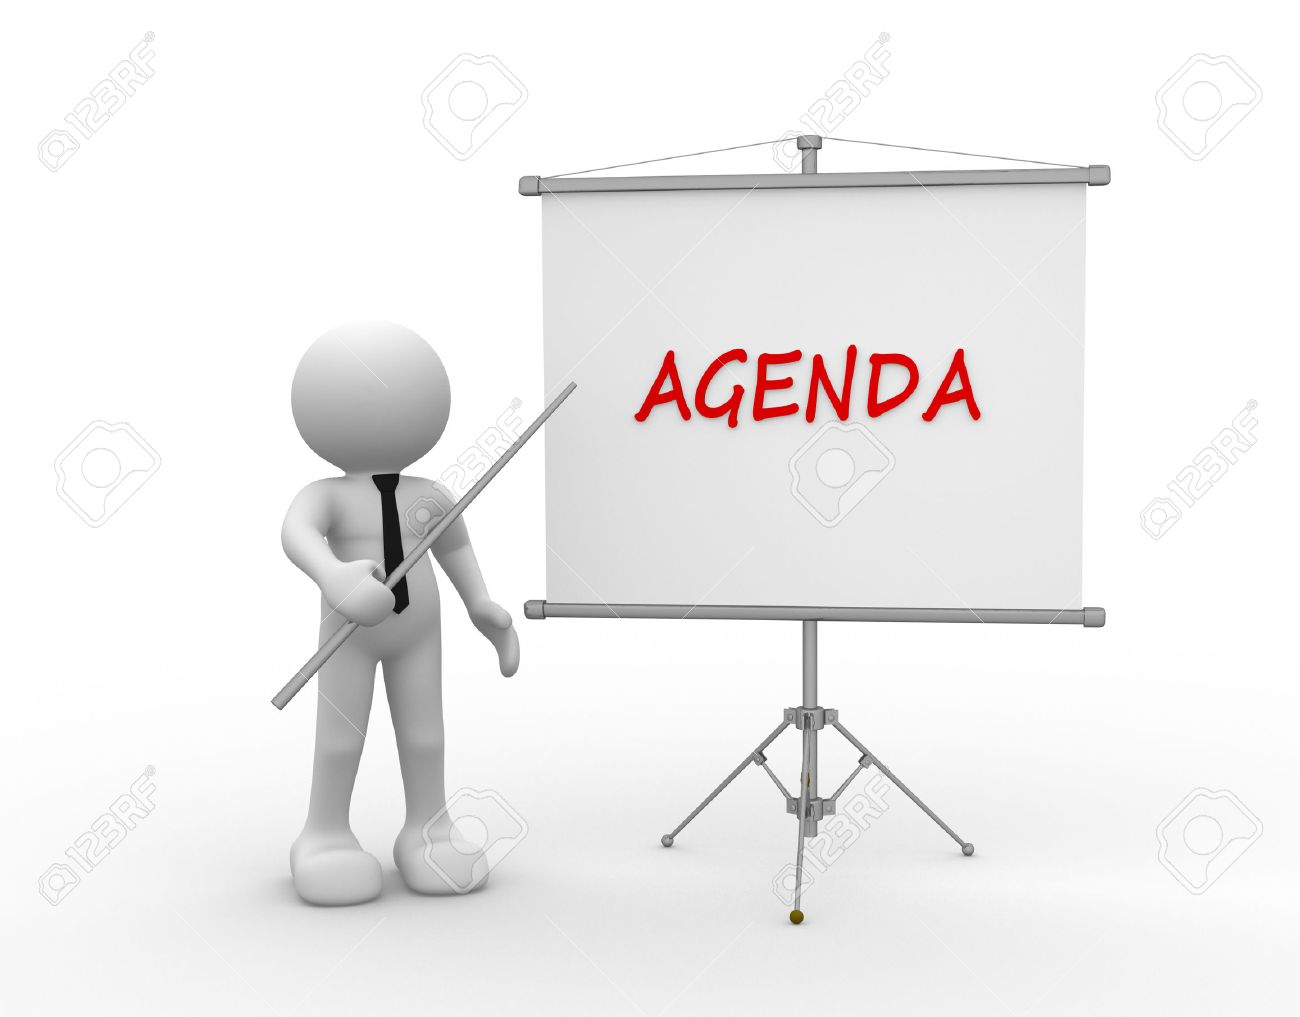 3d people - man, person and flipchart. Agenda Standard-Bild - 43041397